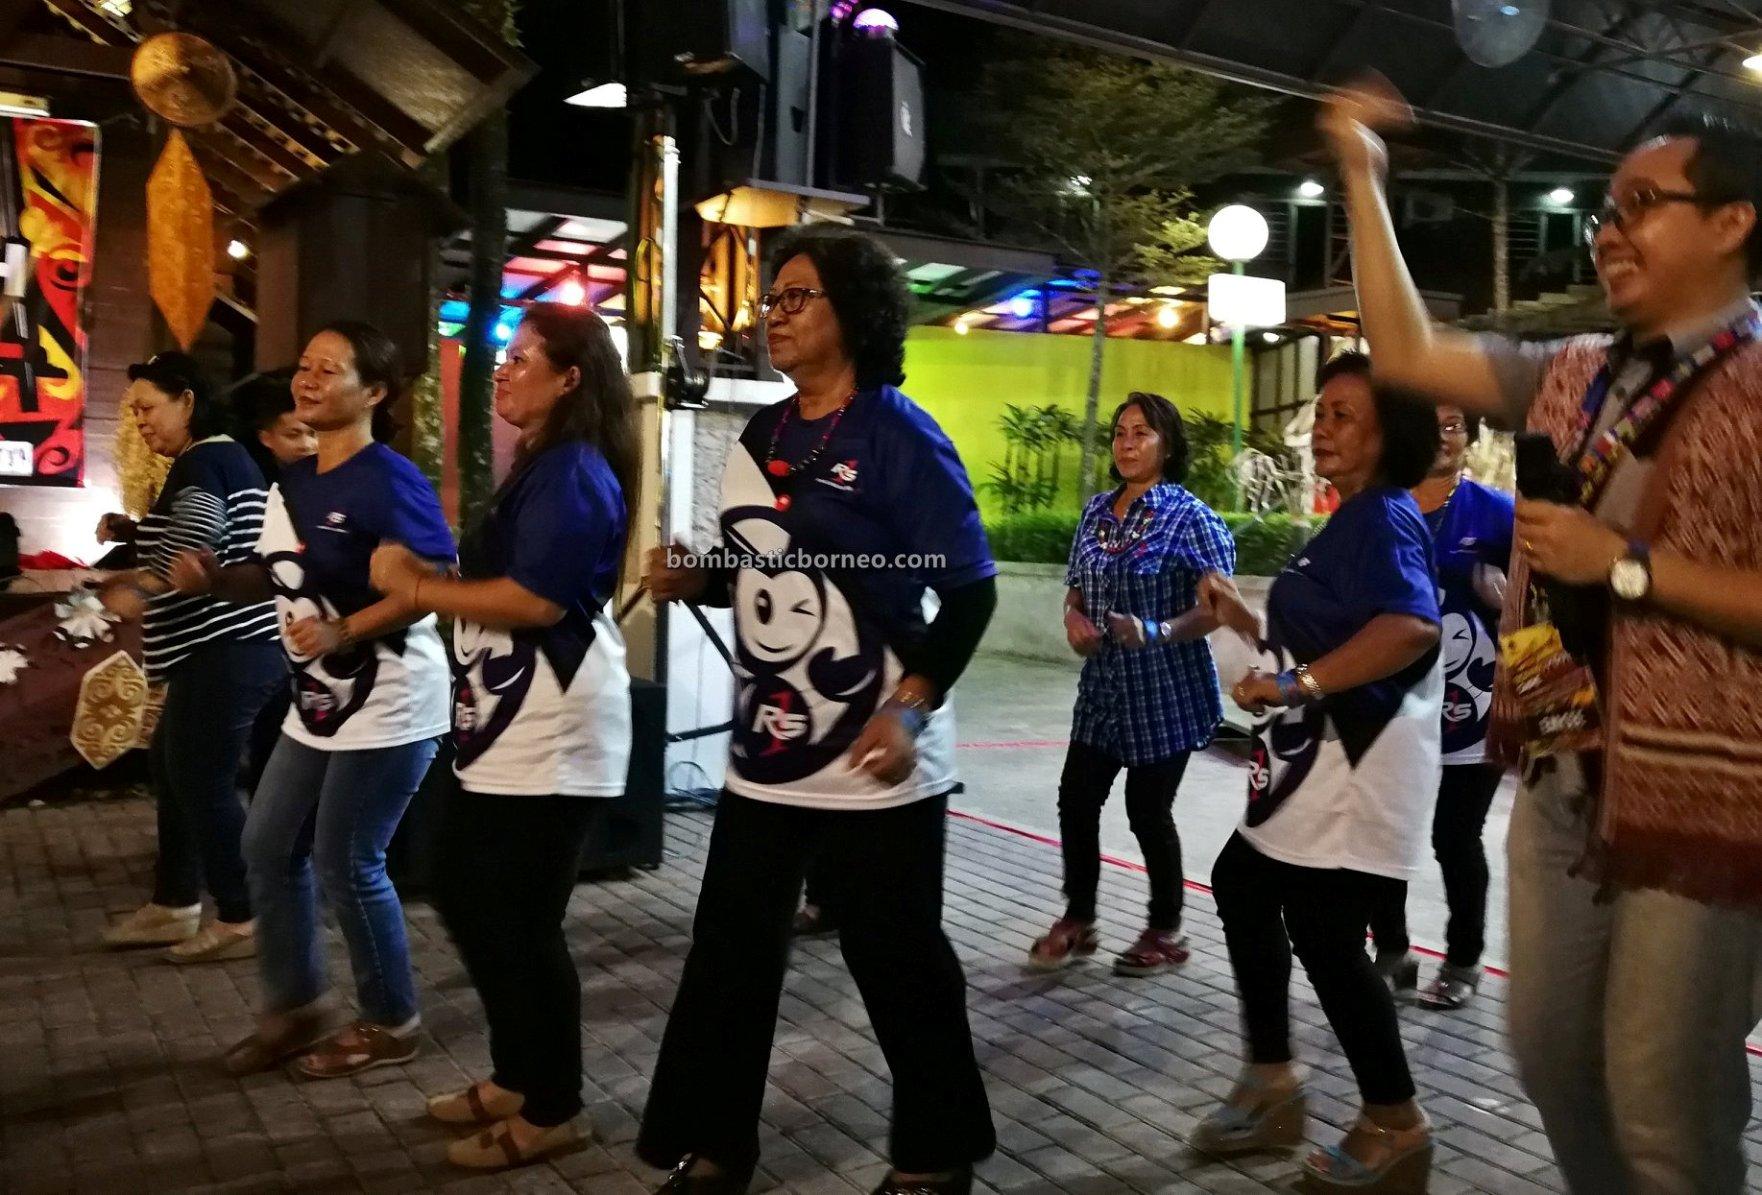 Borneo, traditional, backpackers, event, Ethnic, native, tribe, Sibu, Sarawak, Tourism, tourist attraction, travel guide, 诗巫砂拉越马来西亚, 土著音乐文化